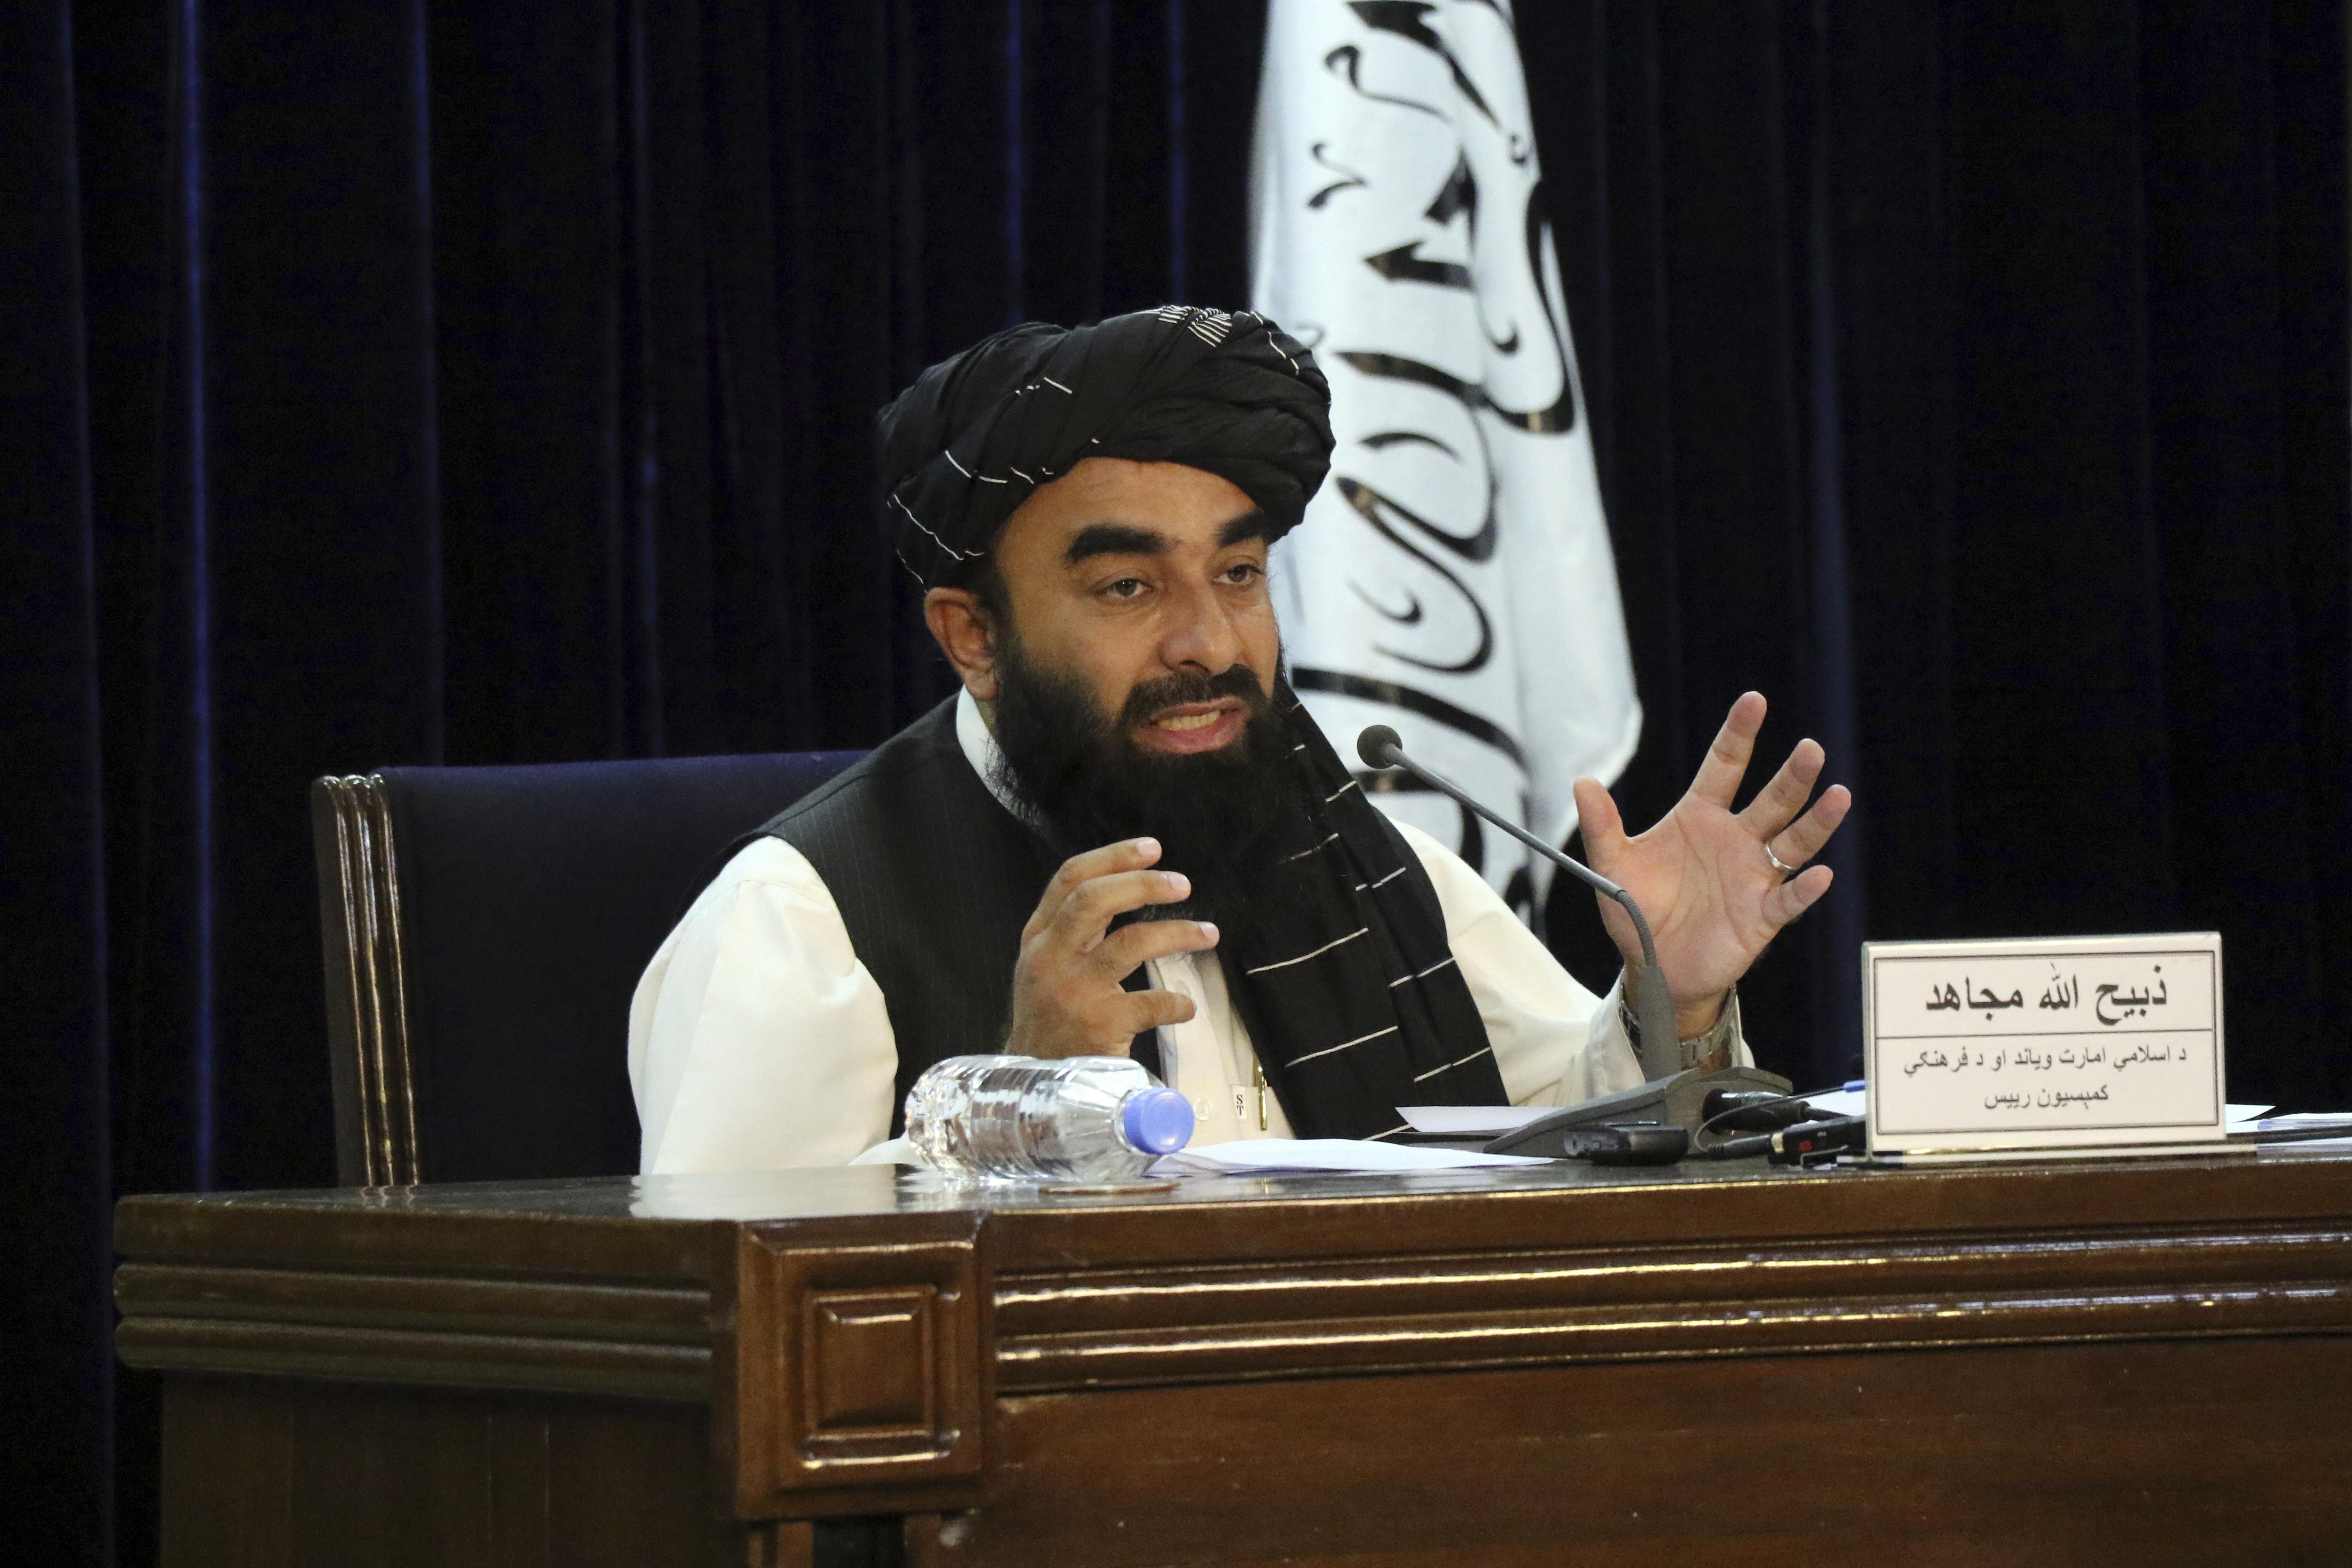 Taliban spokesman Zabihullah Mujahid seen at a press conference in Kabul, Afghanistan Tuesday, Sept. 7, 2021.